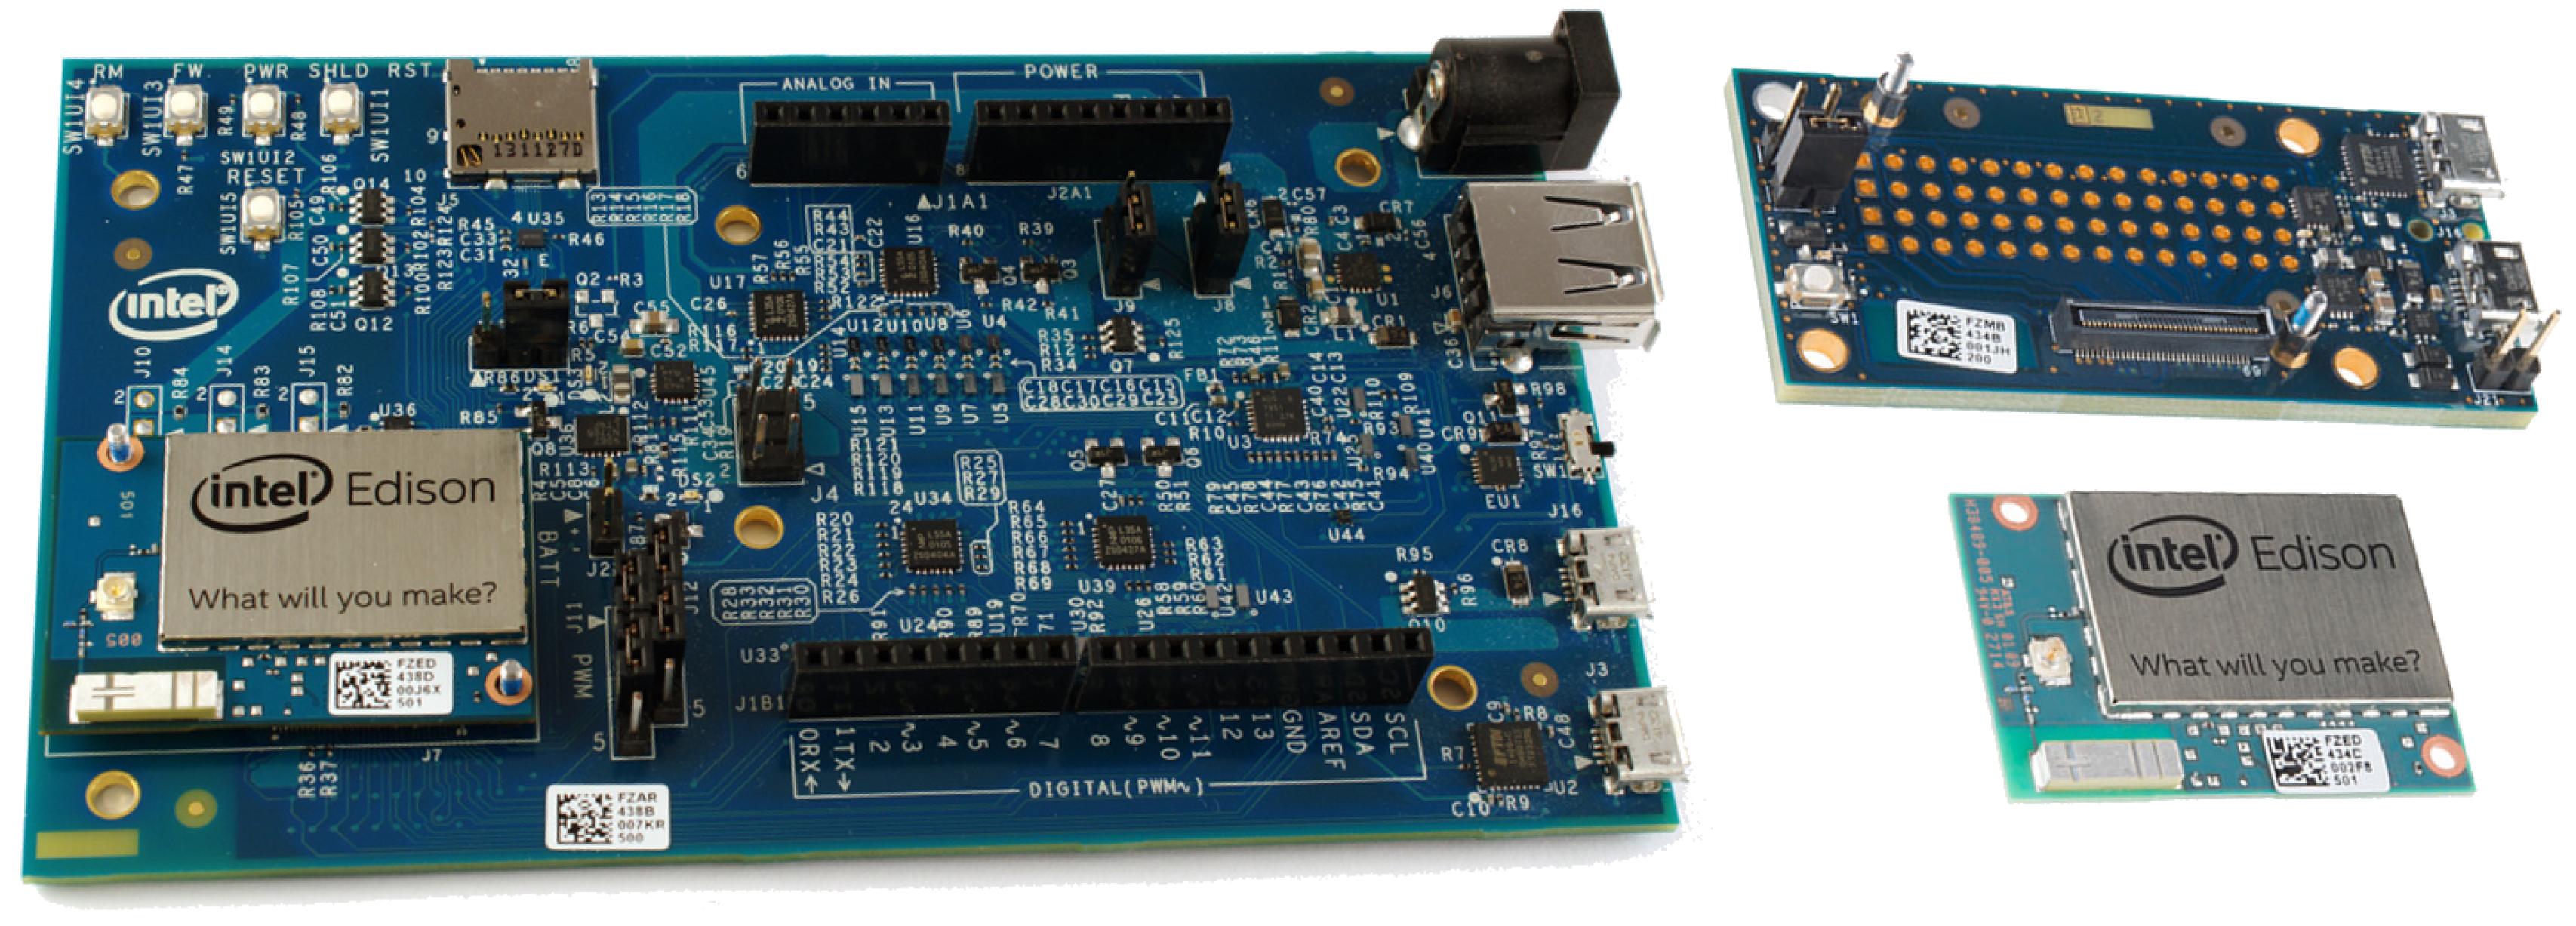 Sensors 18 00460 g015 Sensors Free